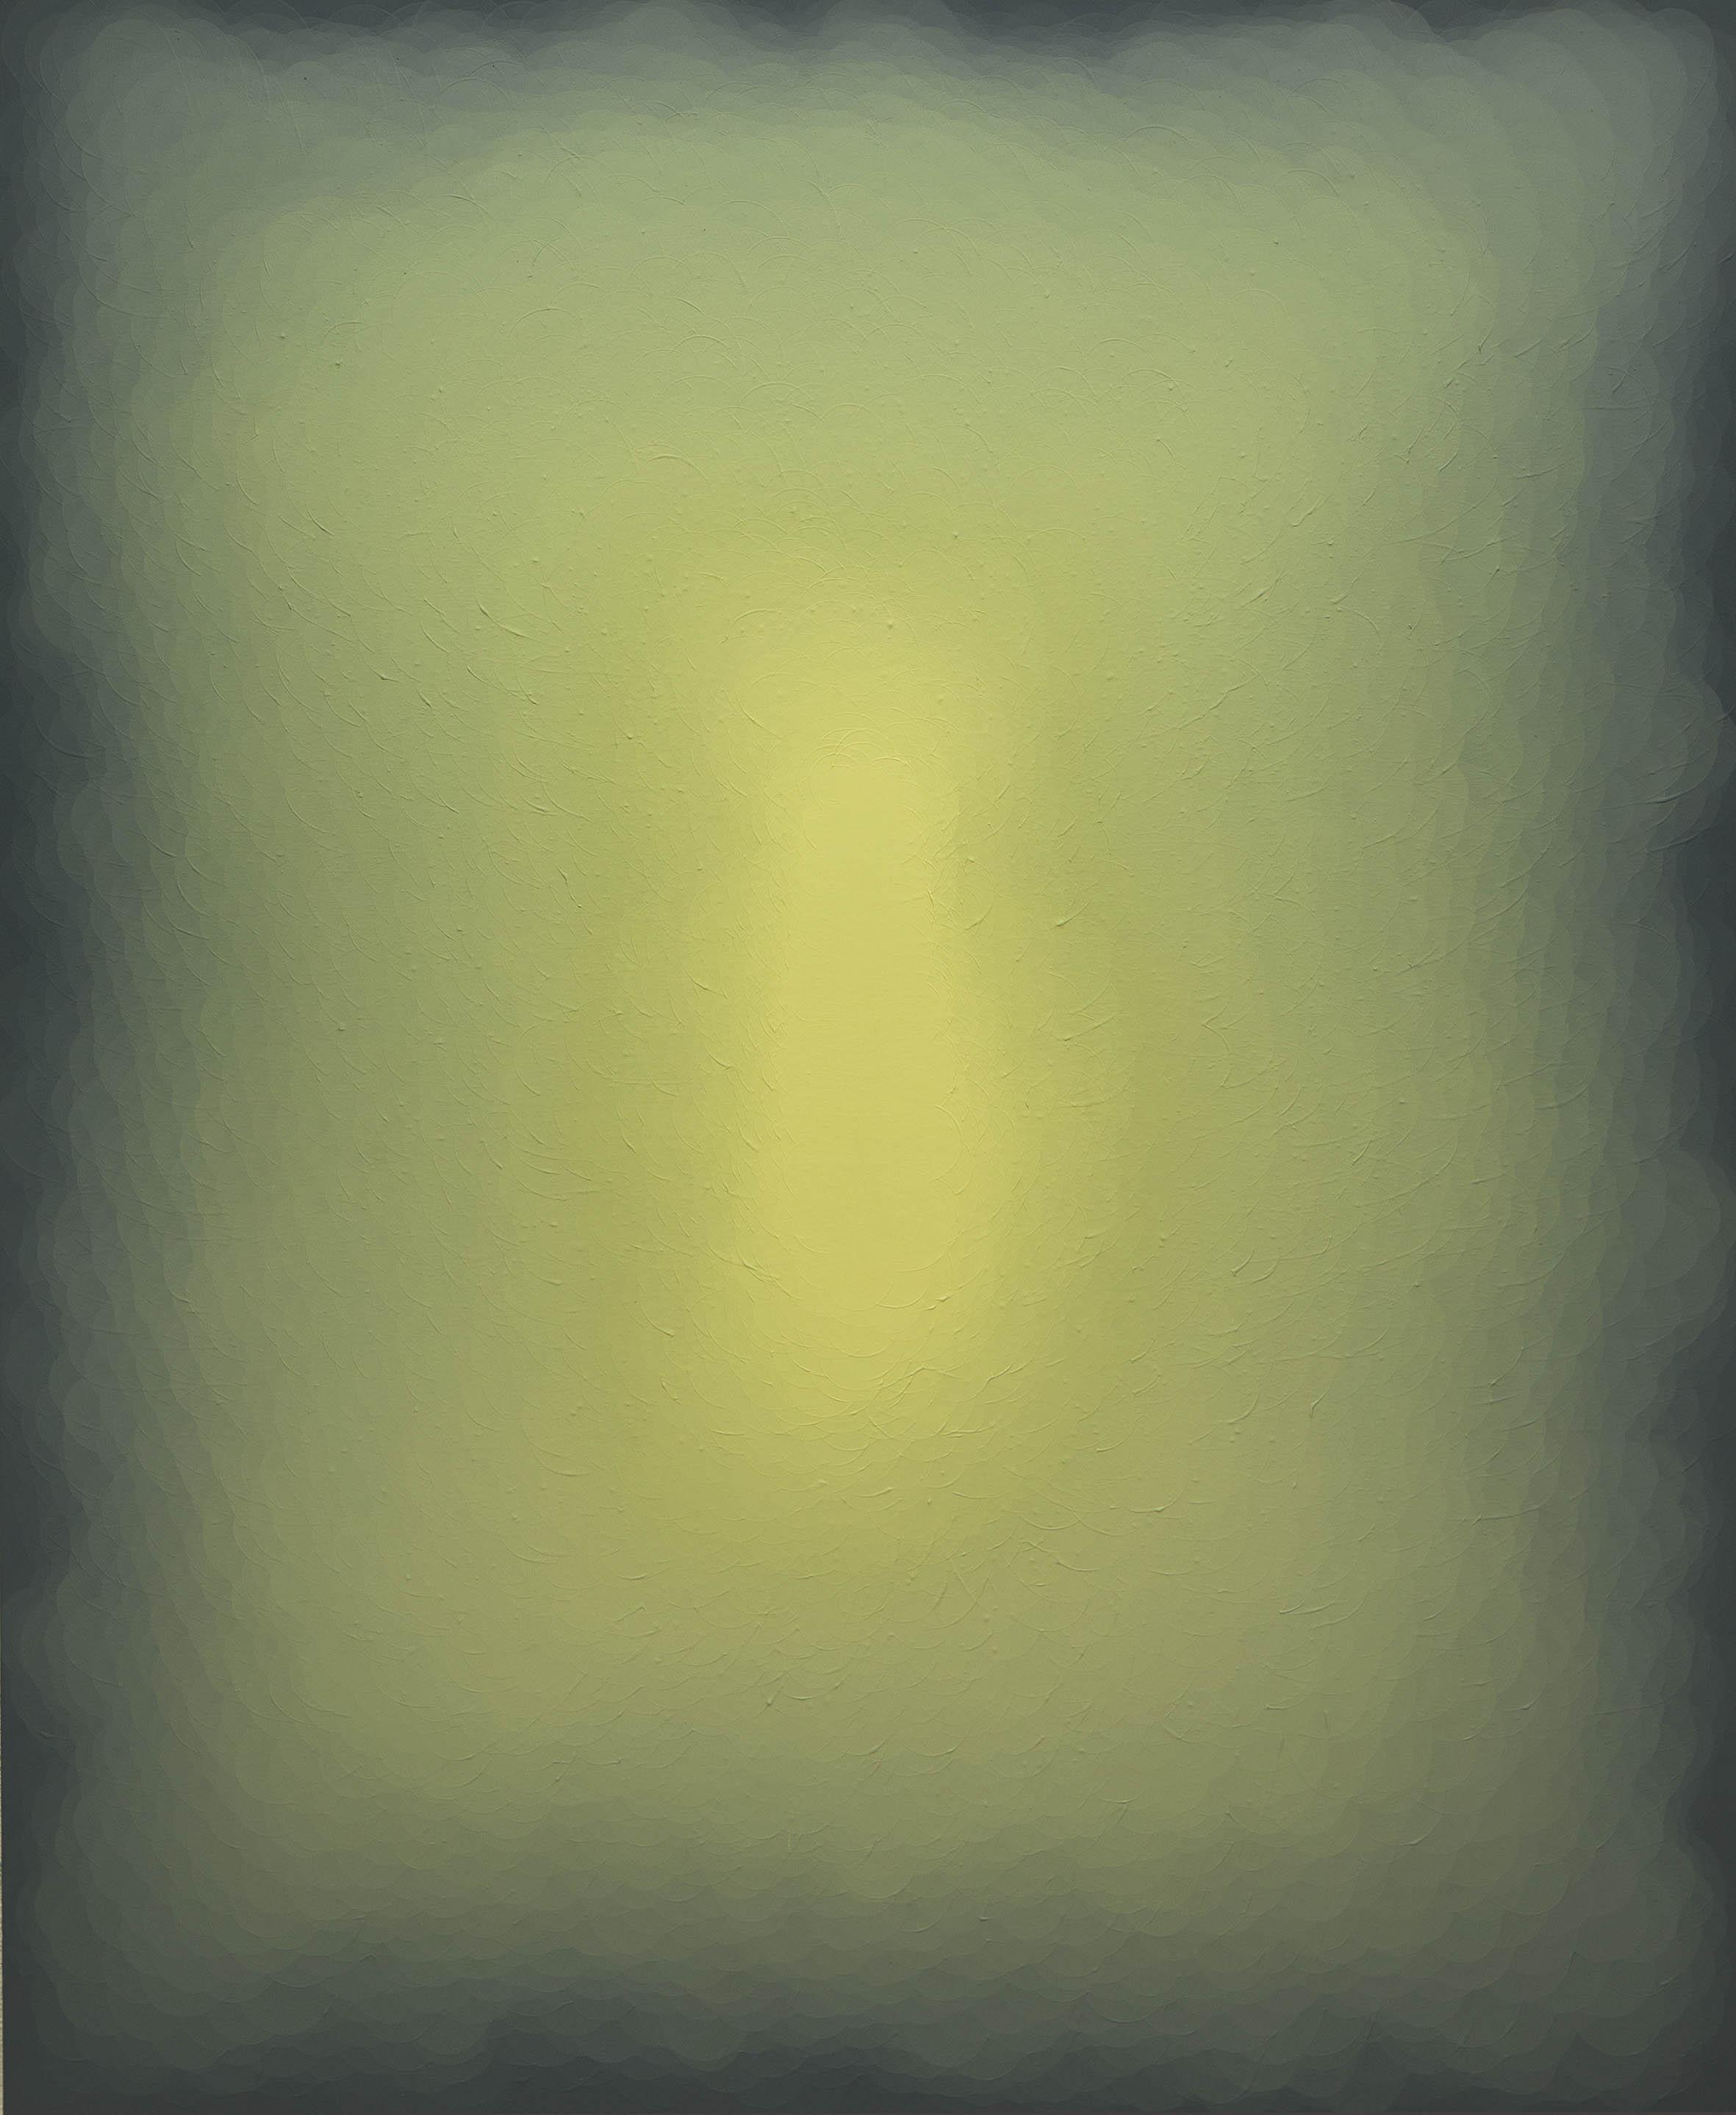 S/T, 2013, acrílico sobre lienzo, 200 x 160 cm.